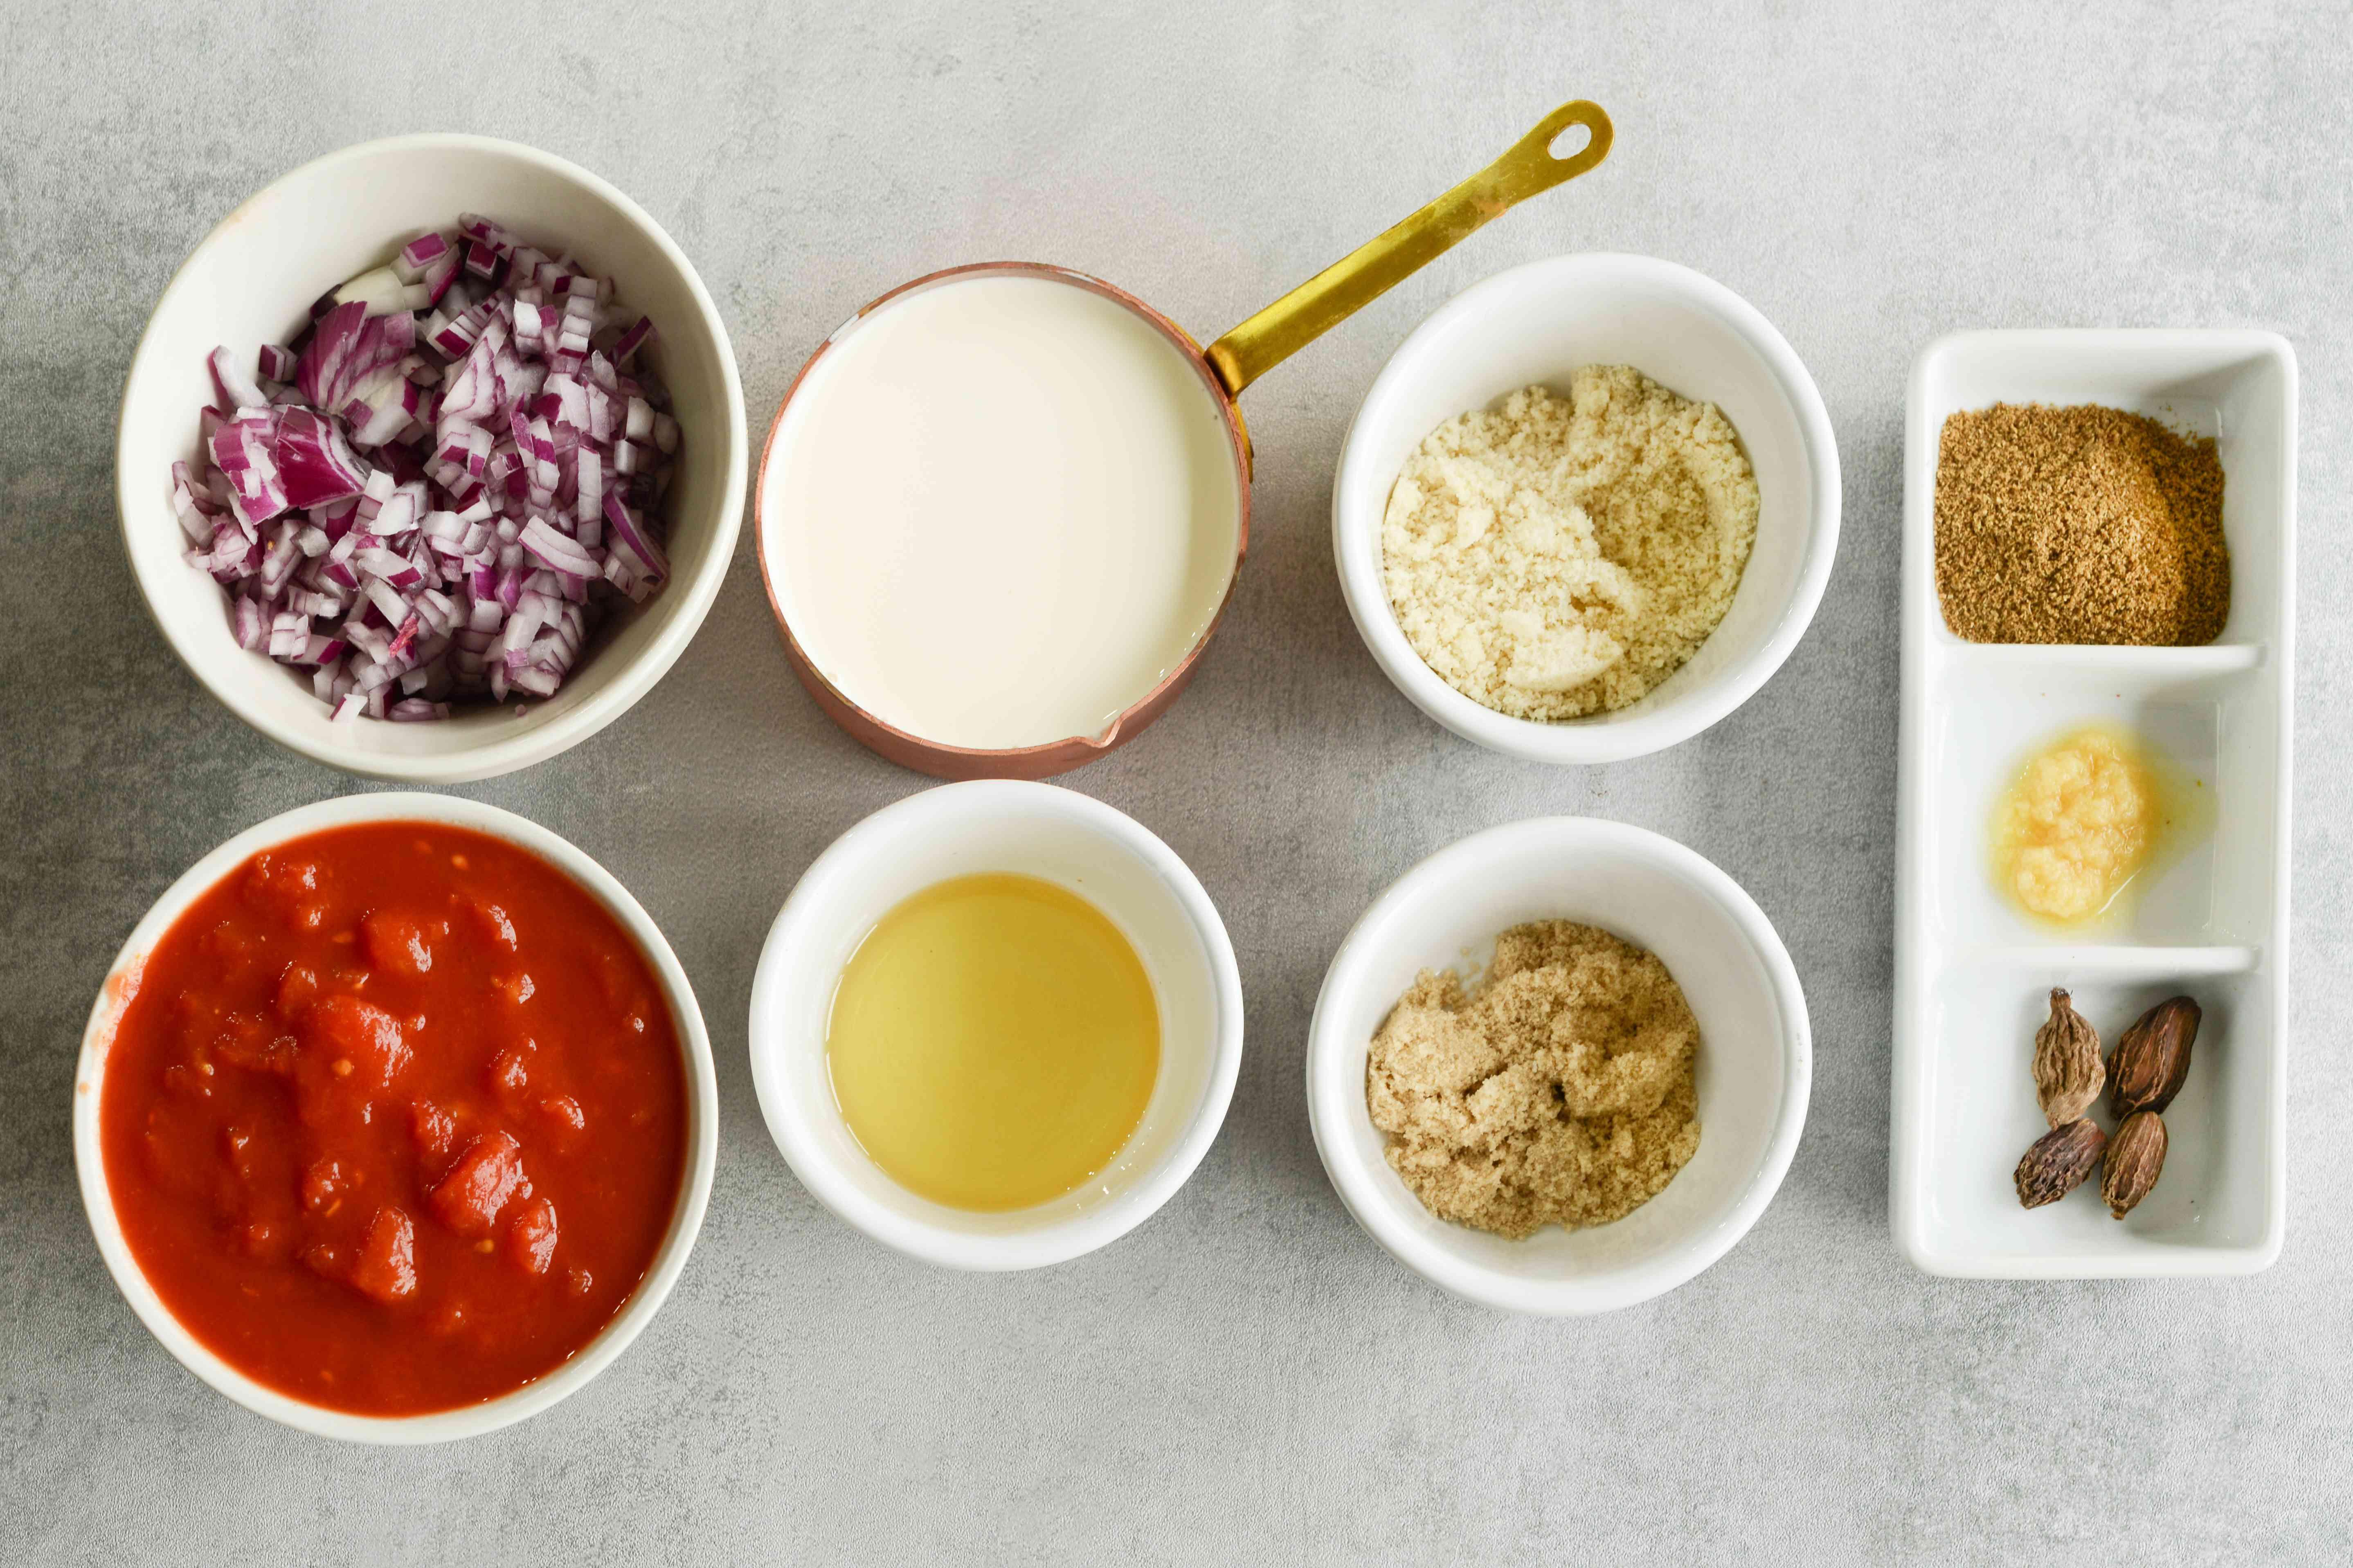 Chicken Tikka Masala ingredients for sauce